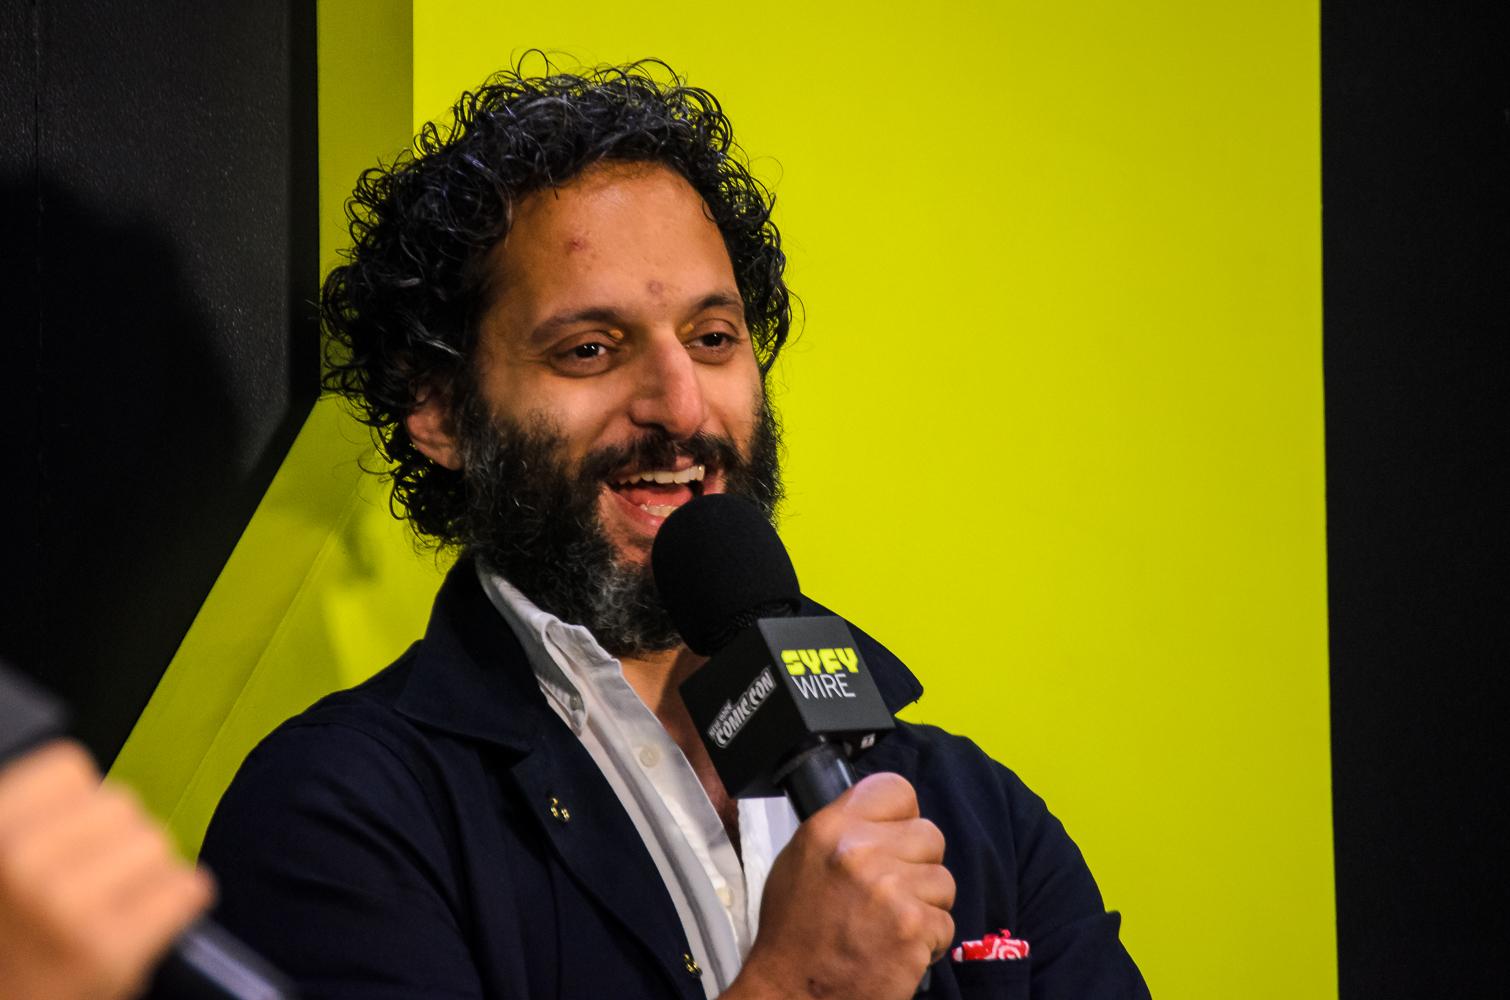 Jason Mantzoukas New York Comic Con 2018 Ben Kaye-2